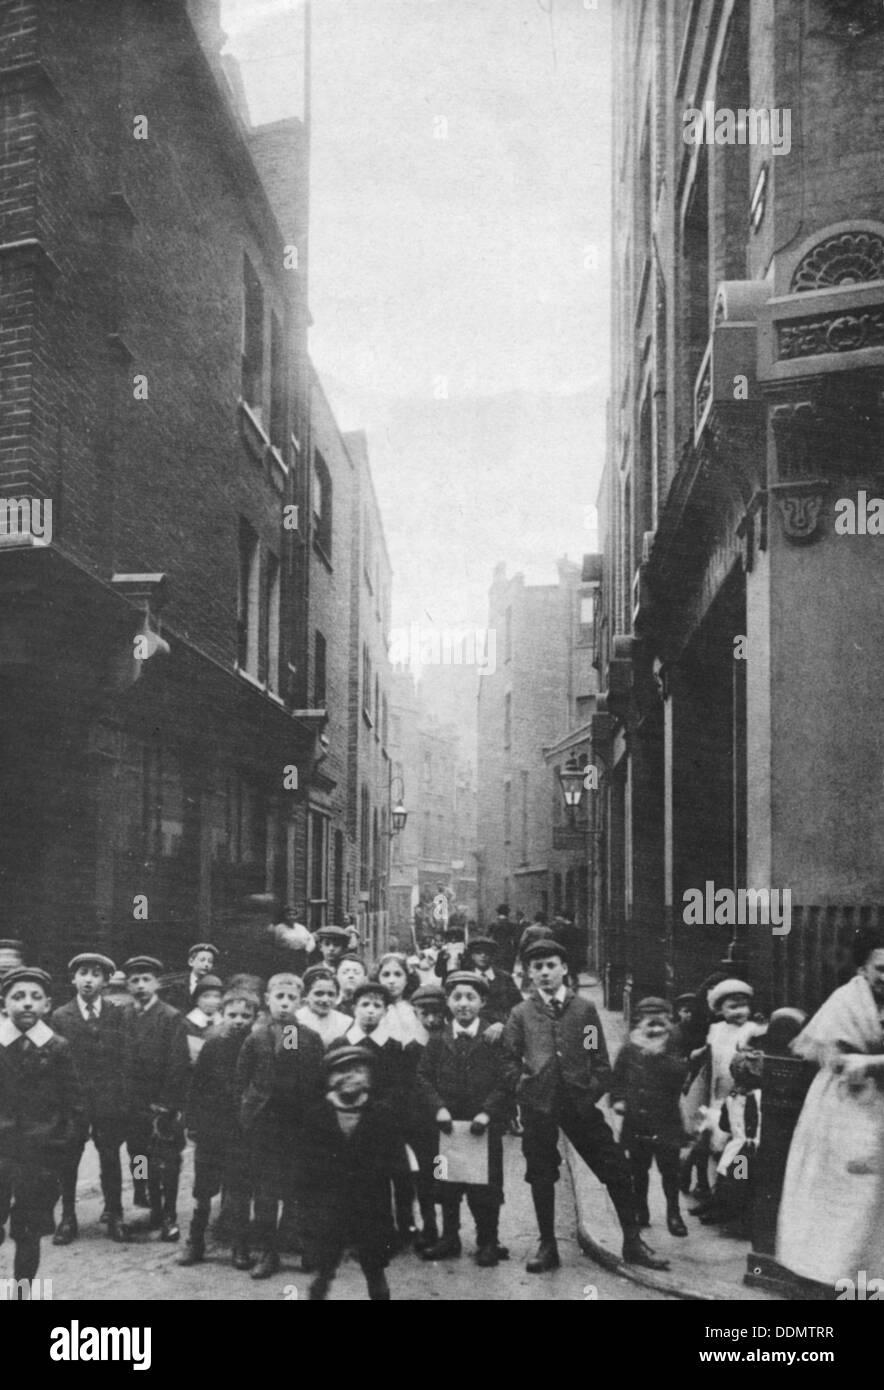 Sandys Row from Artillery Row, East End, London, 1912. - Stock Image